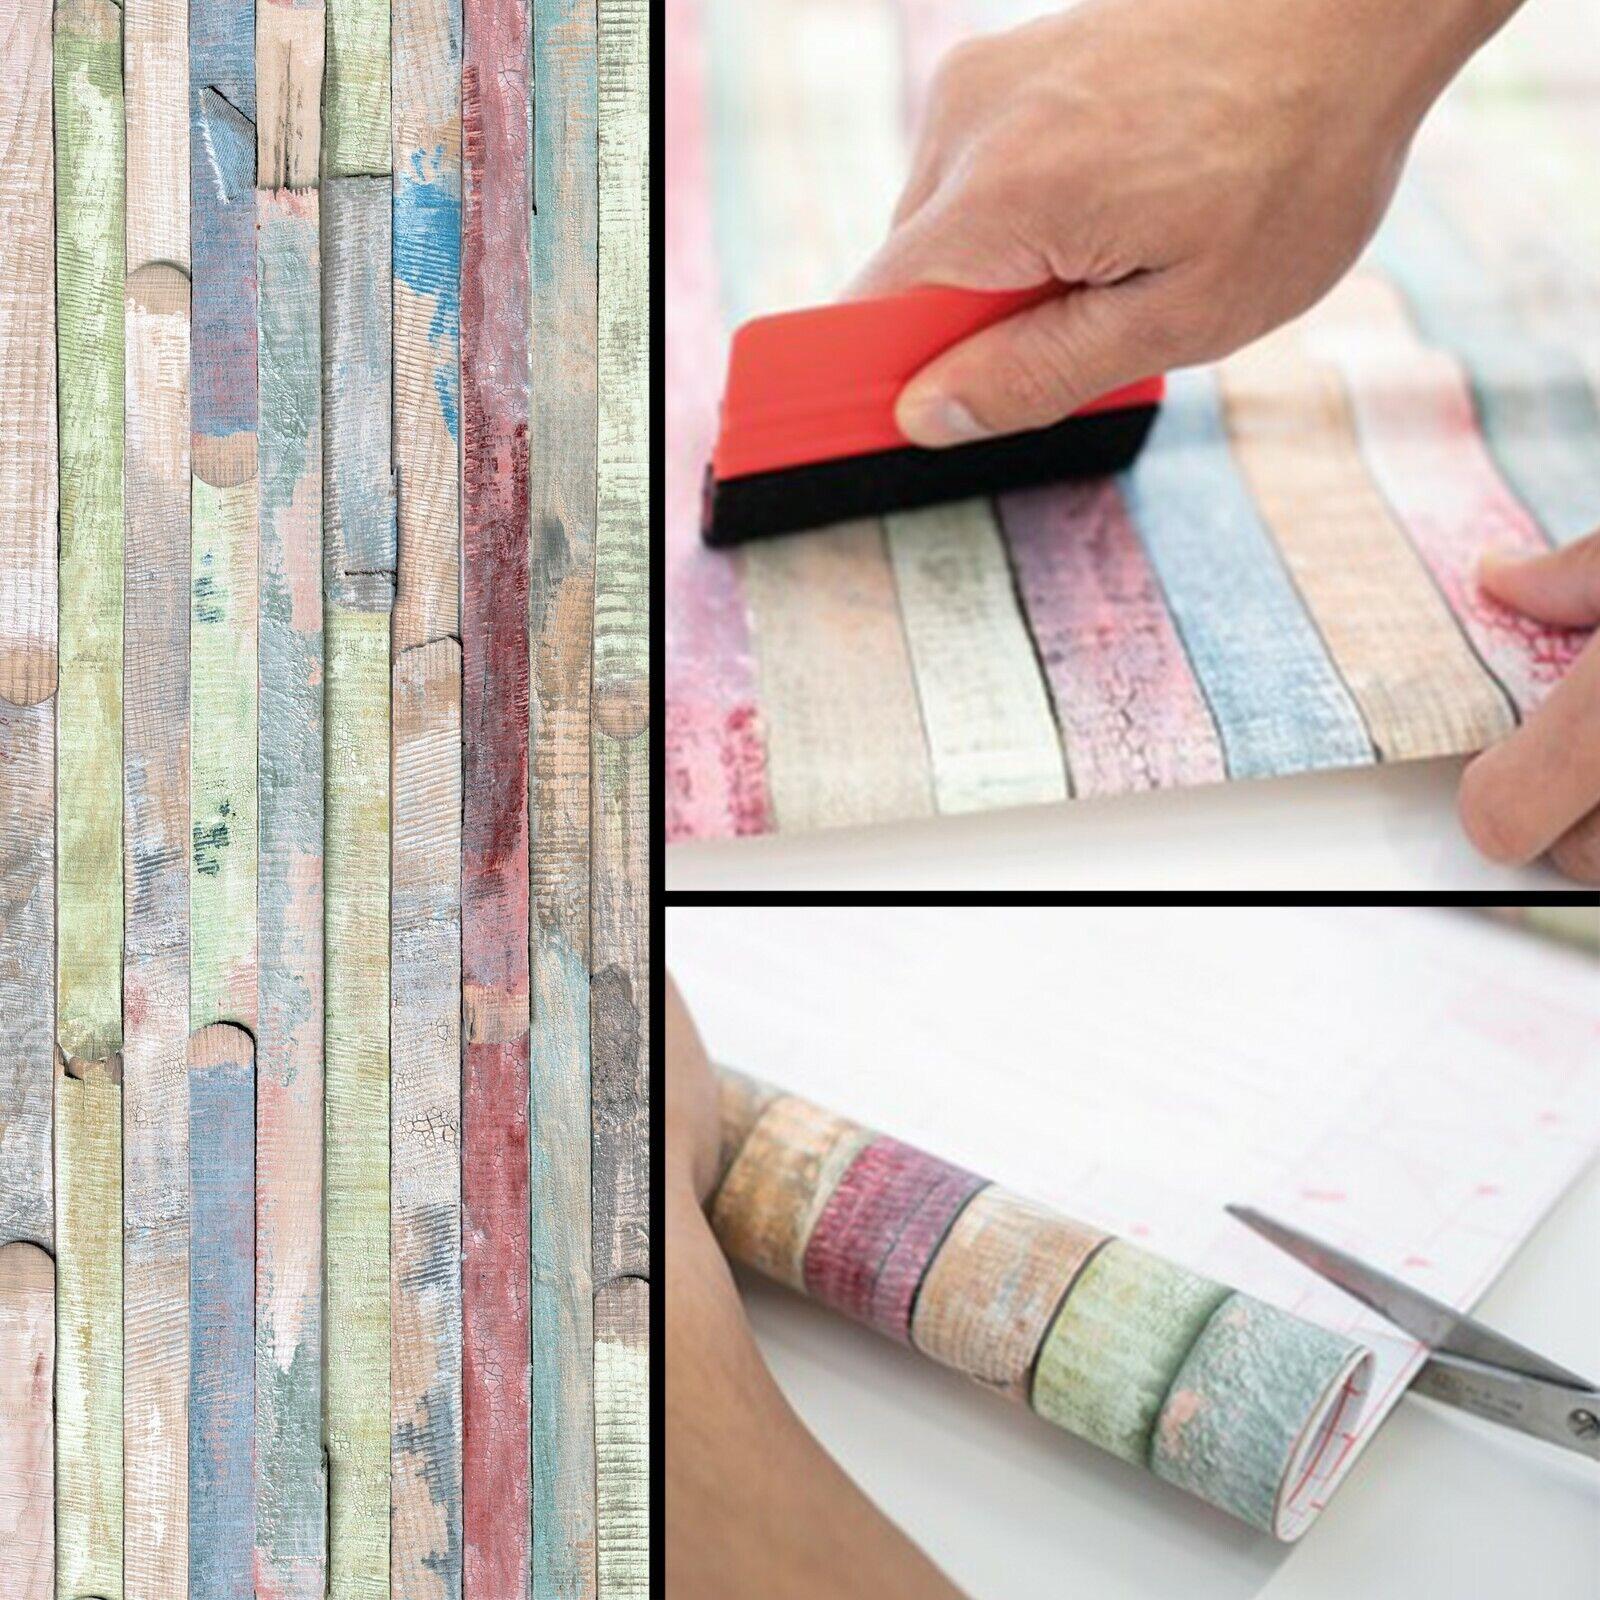 Möbelfolie 6€/m² Rio Bunte Planken Holz Folie selbstklebende d-c-fix Fototapete